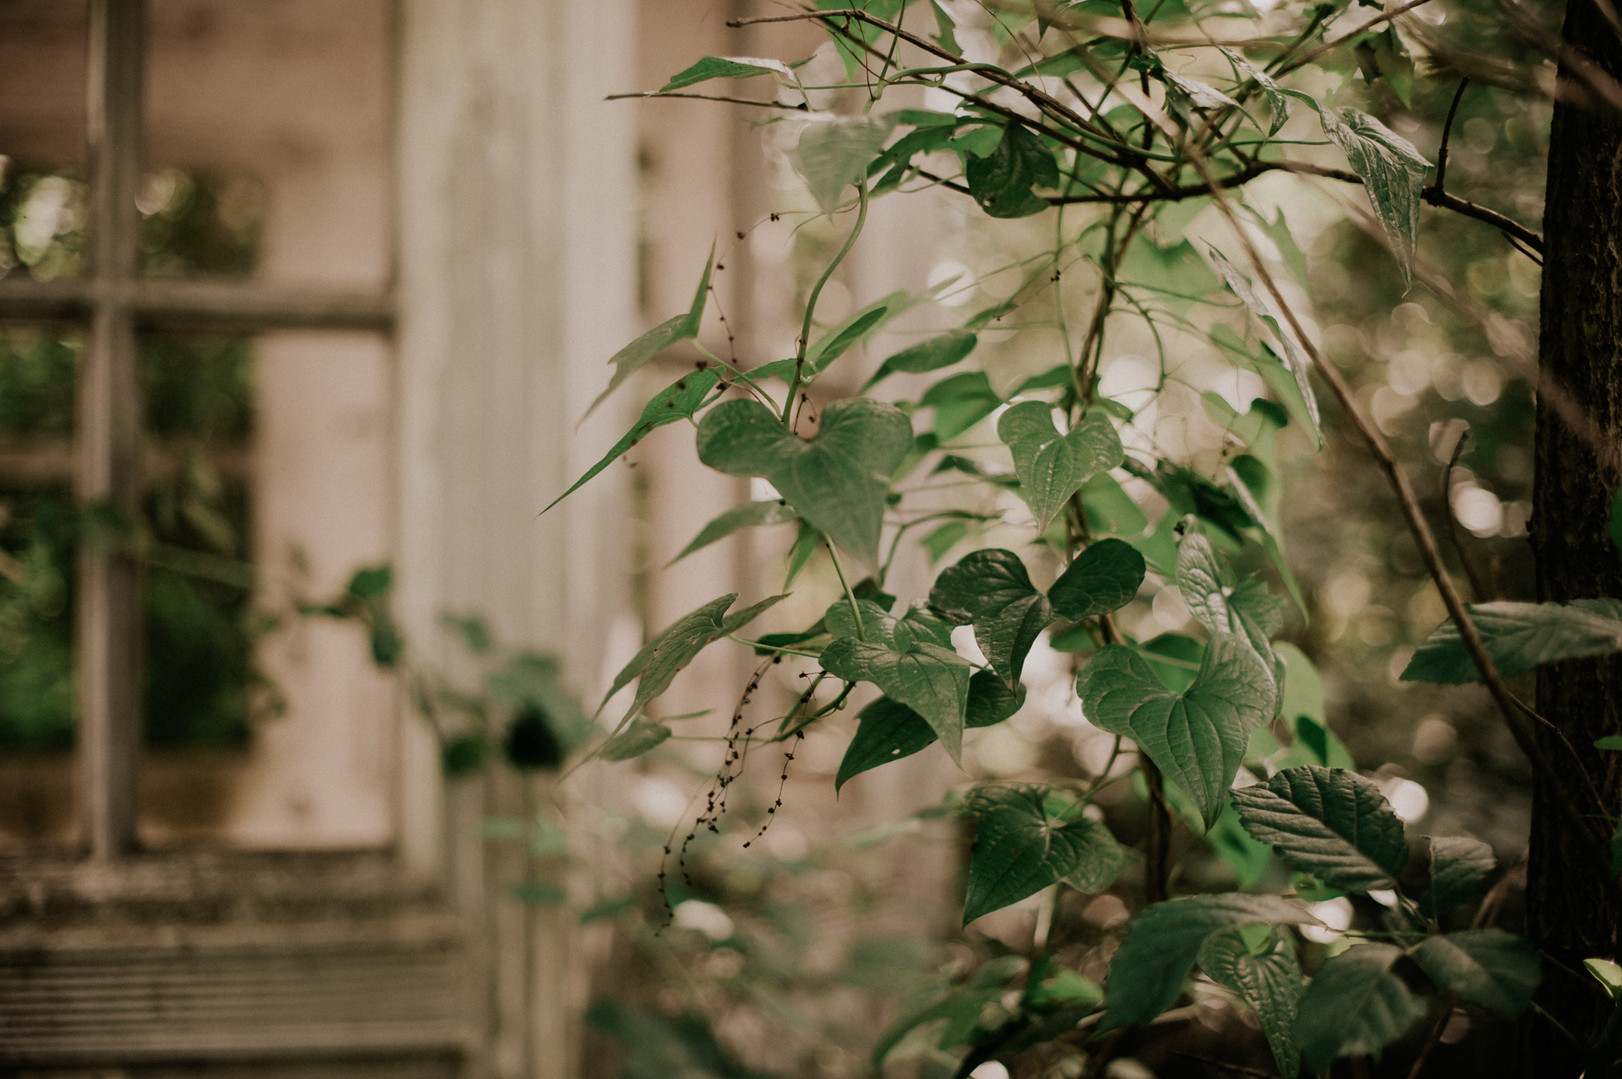 photographe - Céline Déligey